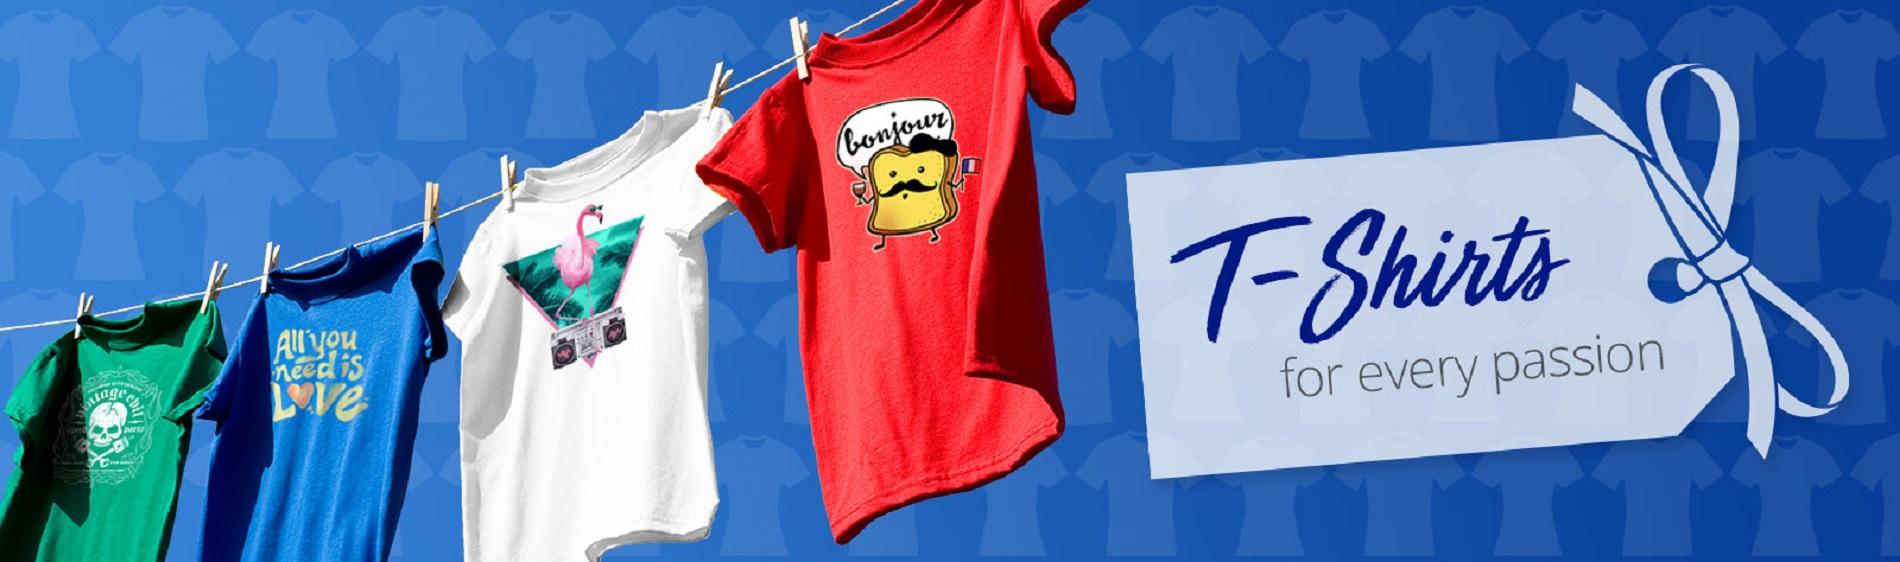 T Shirts Printing Polokwane Print Your T Shirts At Limprint Co Za